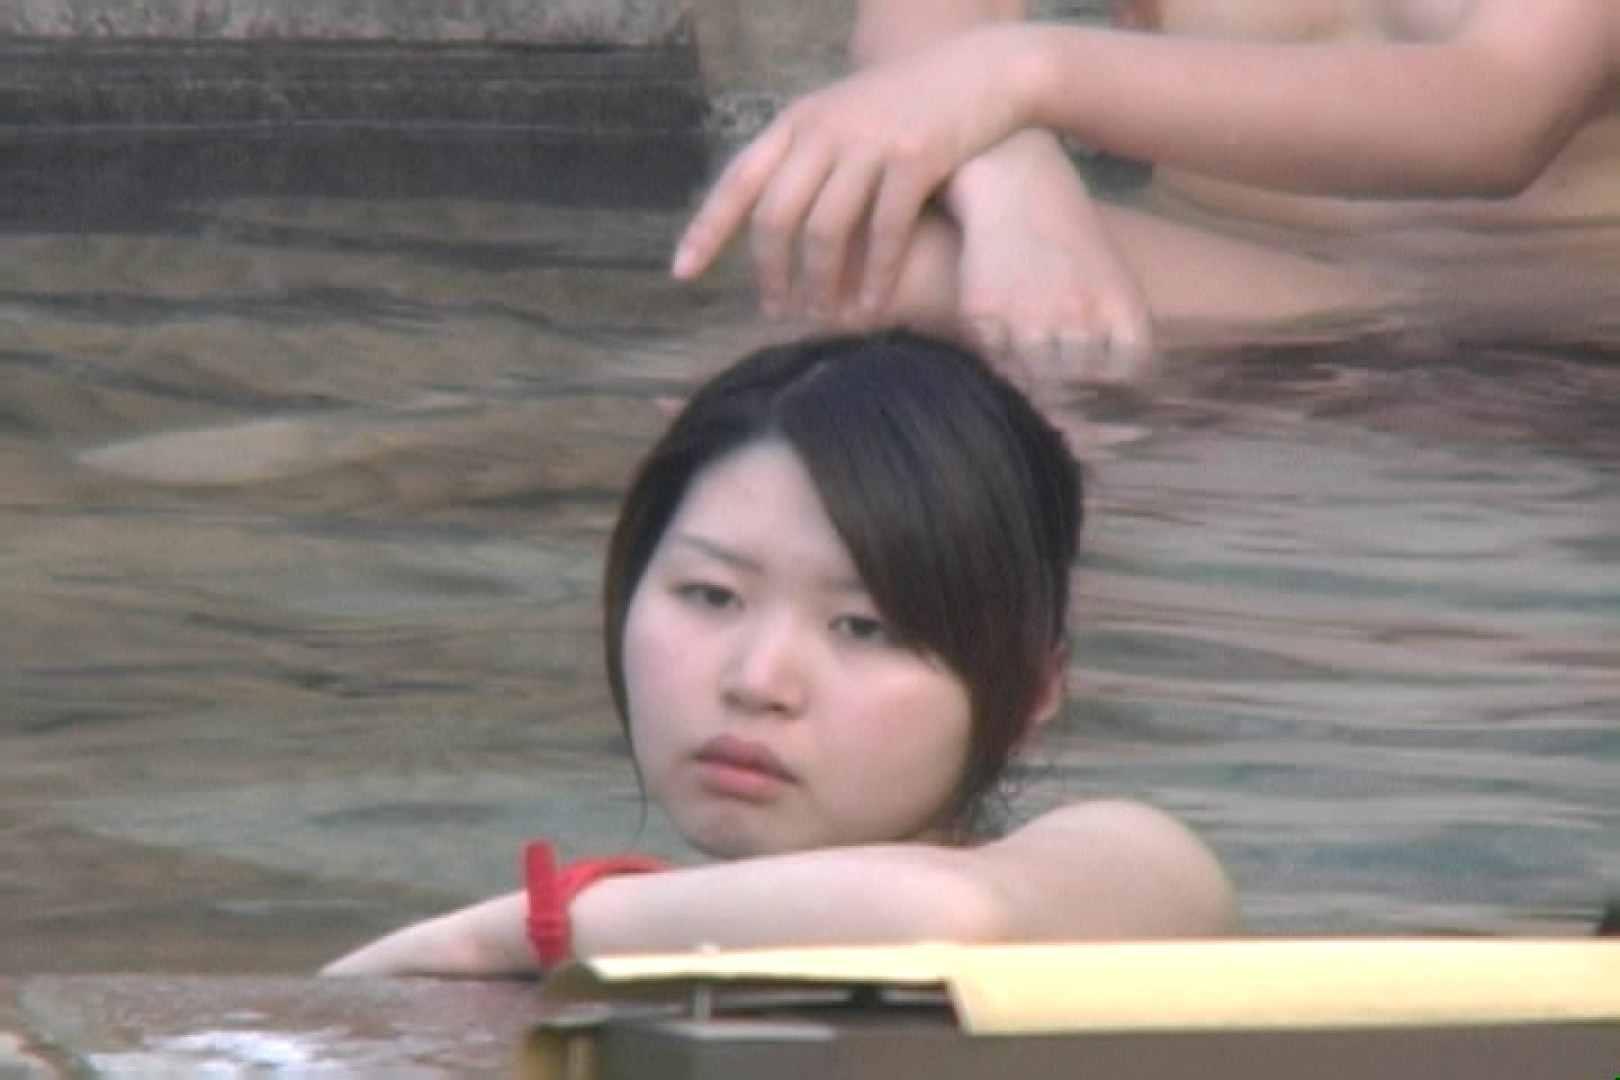 Aquaな露天風呂Vol.60 盗撮  28連発 9